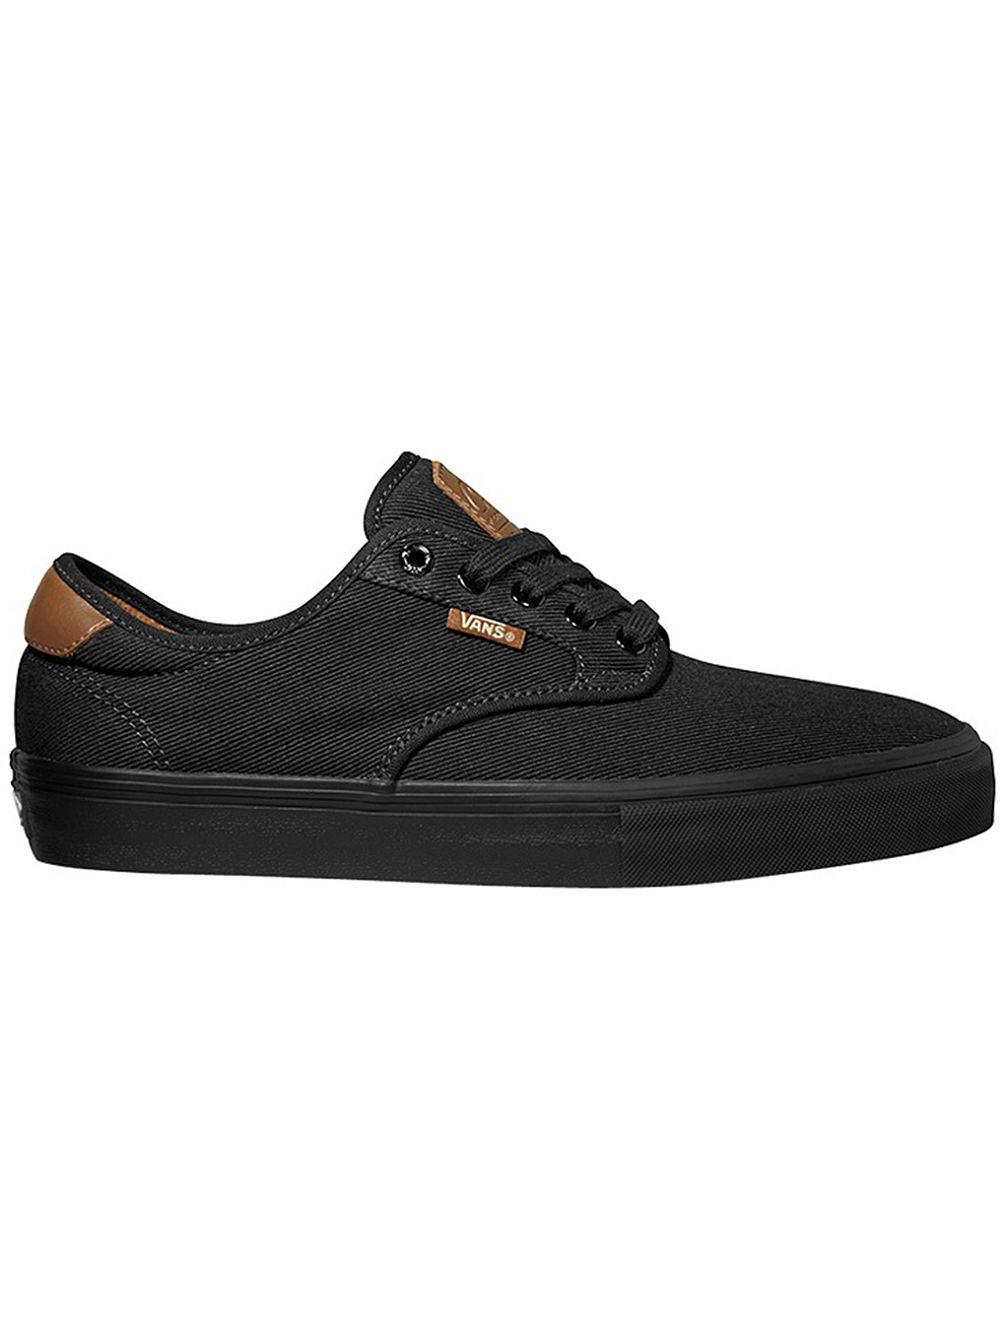 Vans Chima Ferguson Pro Skate Shoes